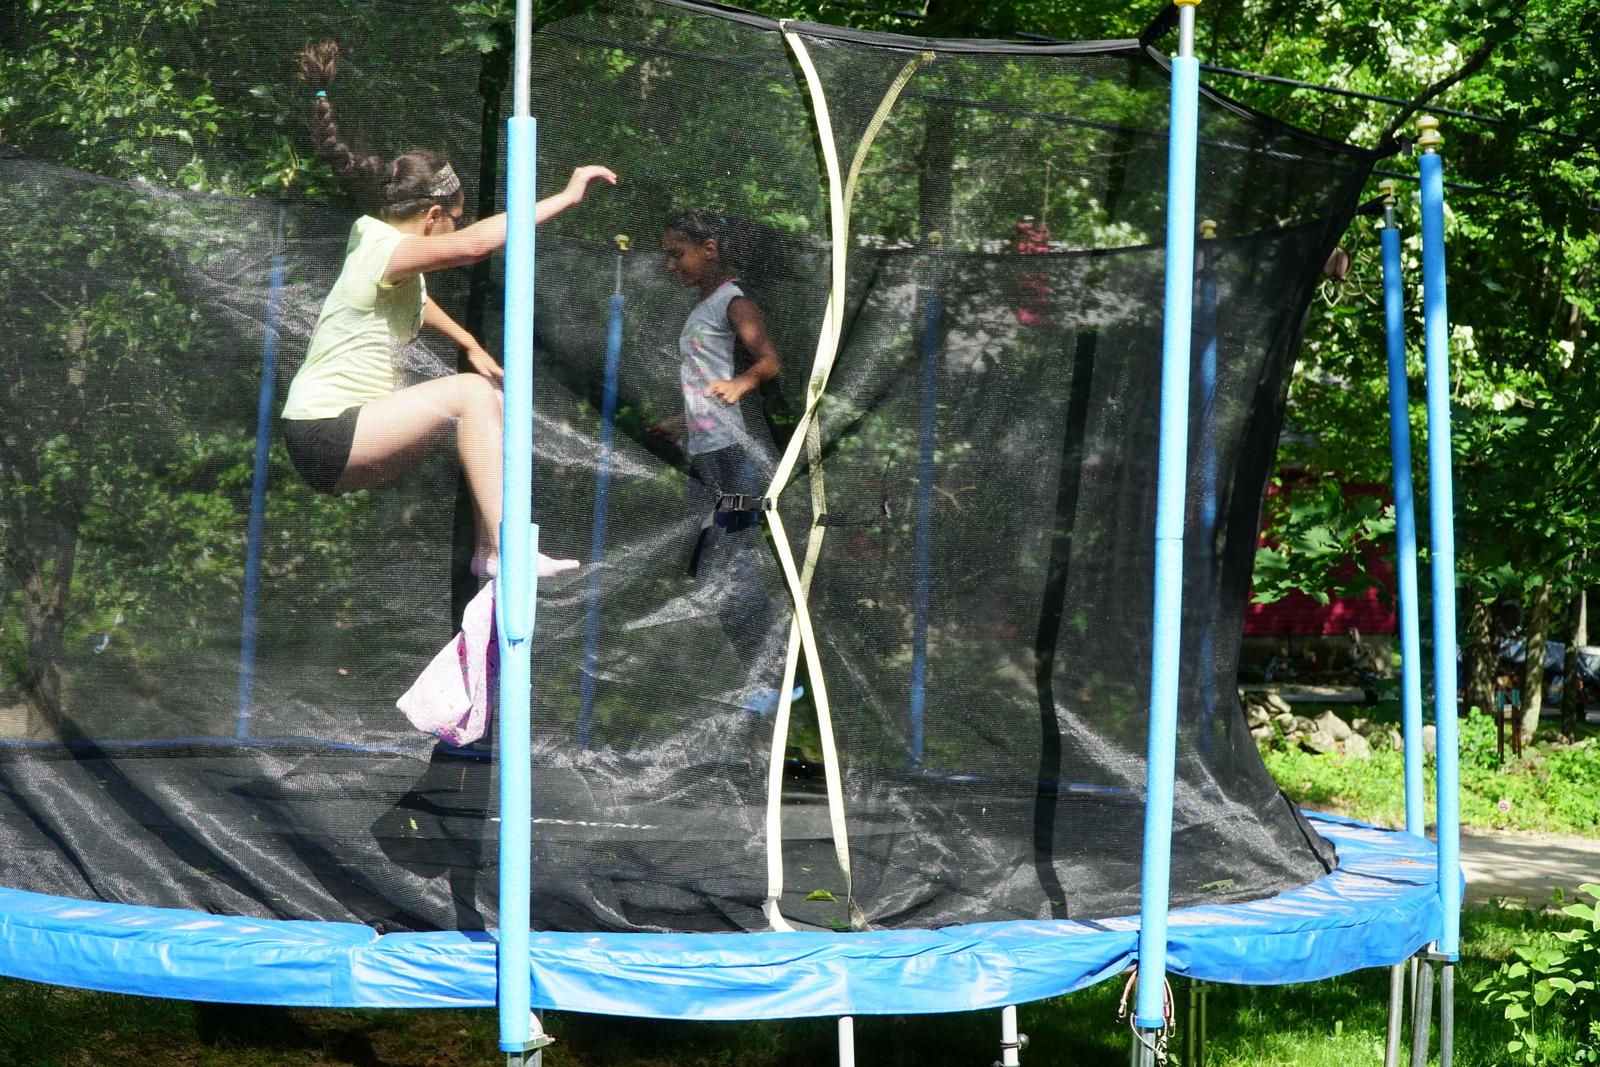 Anura Guruge Sony a6500 Alton trampoline July 2017 New Hampshire